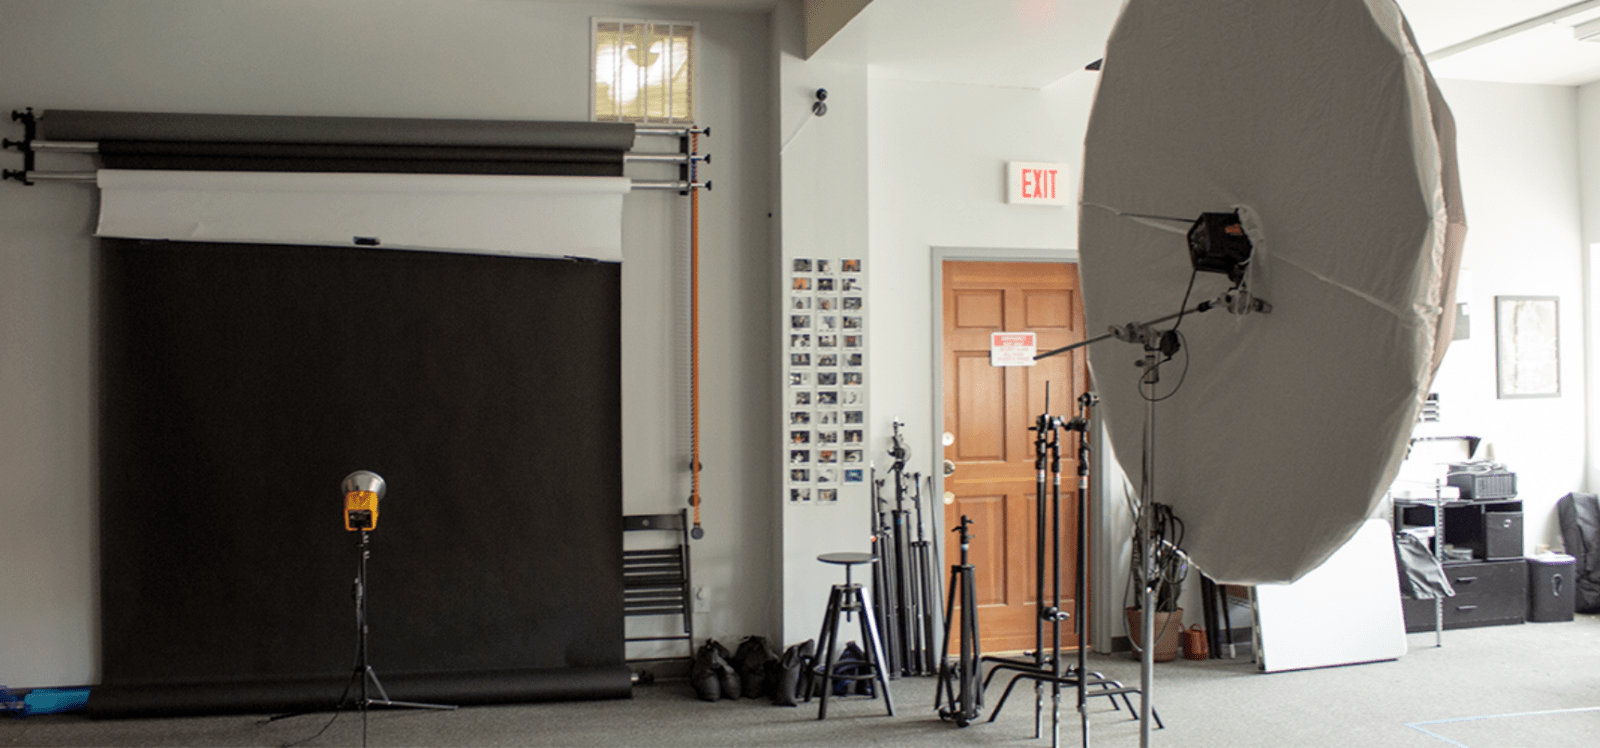 video production in an Eau Claire studio